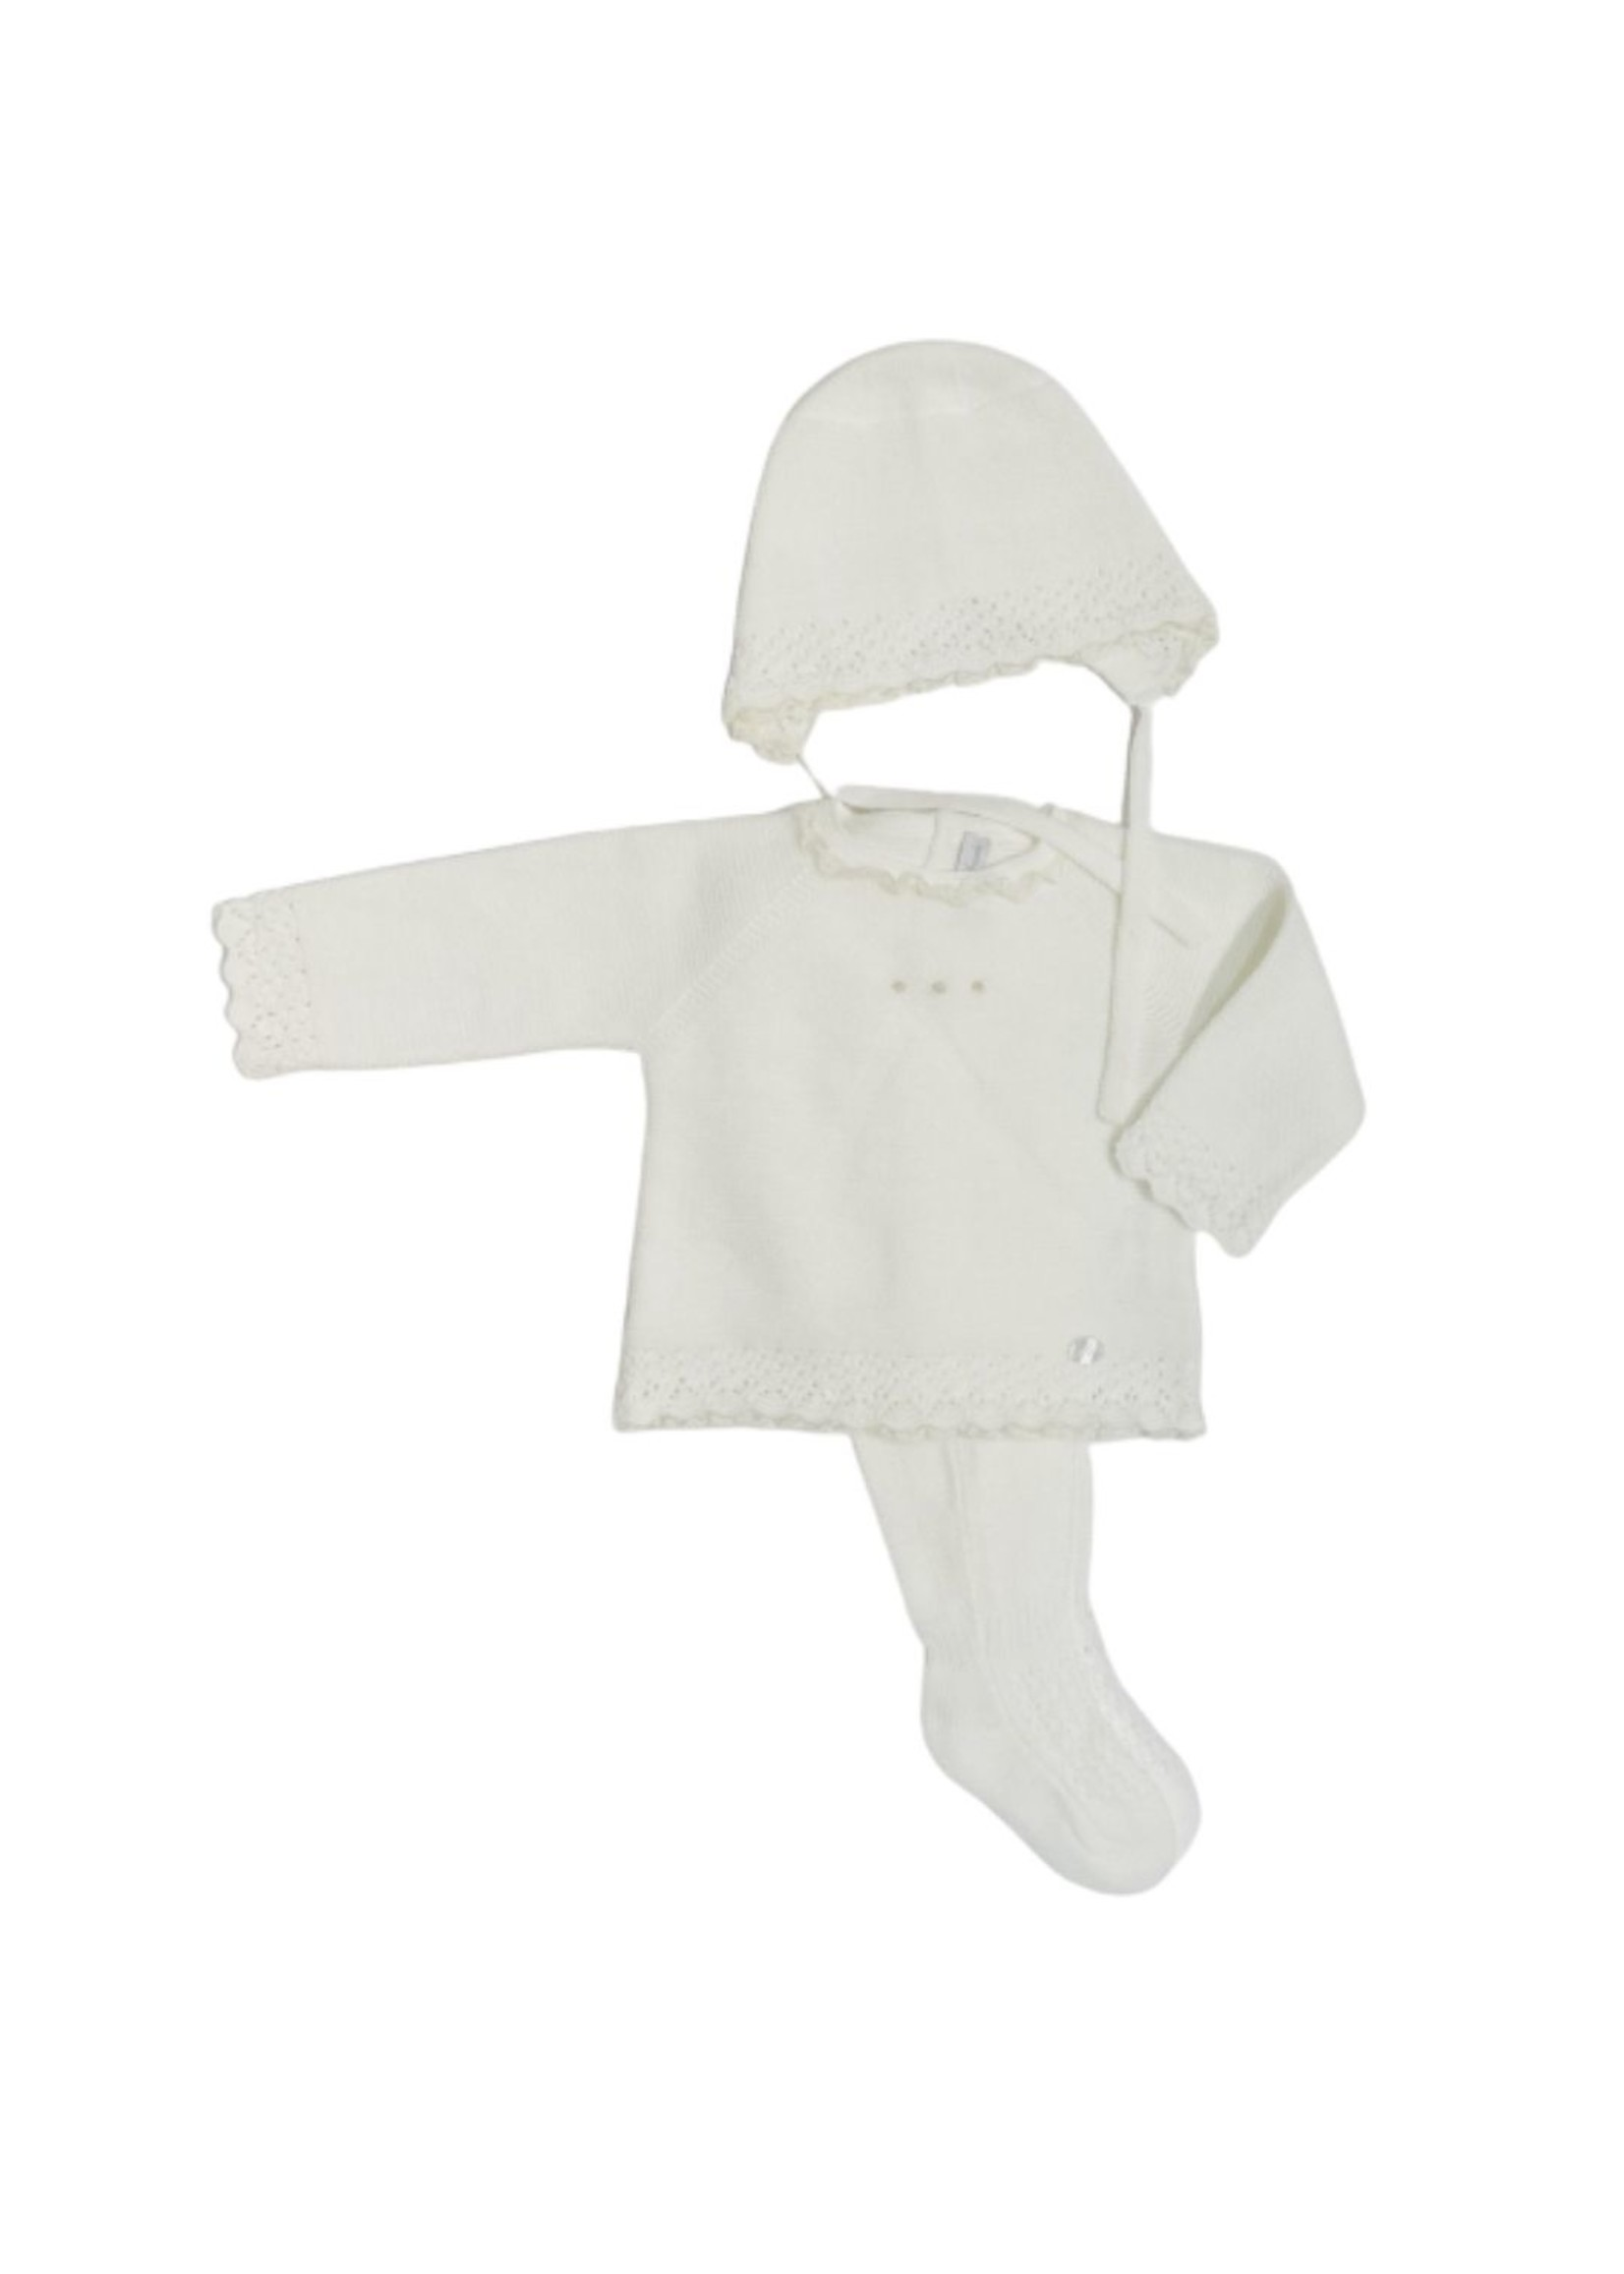 Ivory Knit Sweater Legging and Bonnet Set